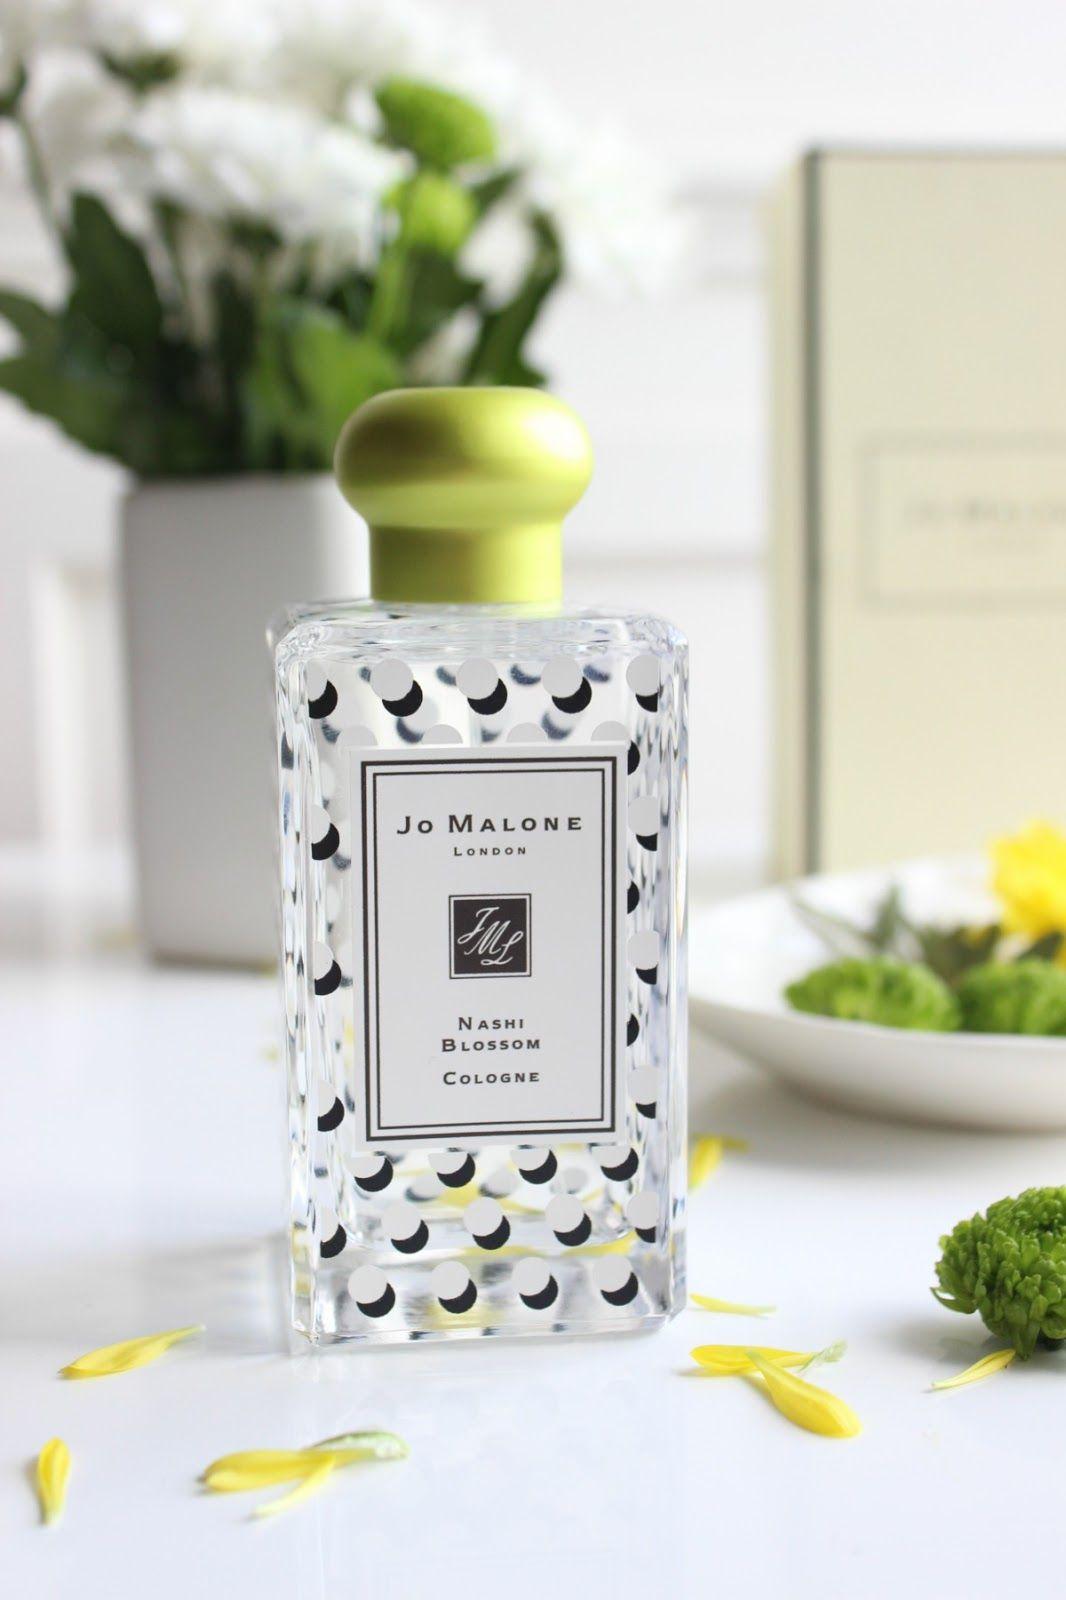 Jo Malone Nashi Blossom Cologne My Adorable Parfume Jo Malone